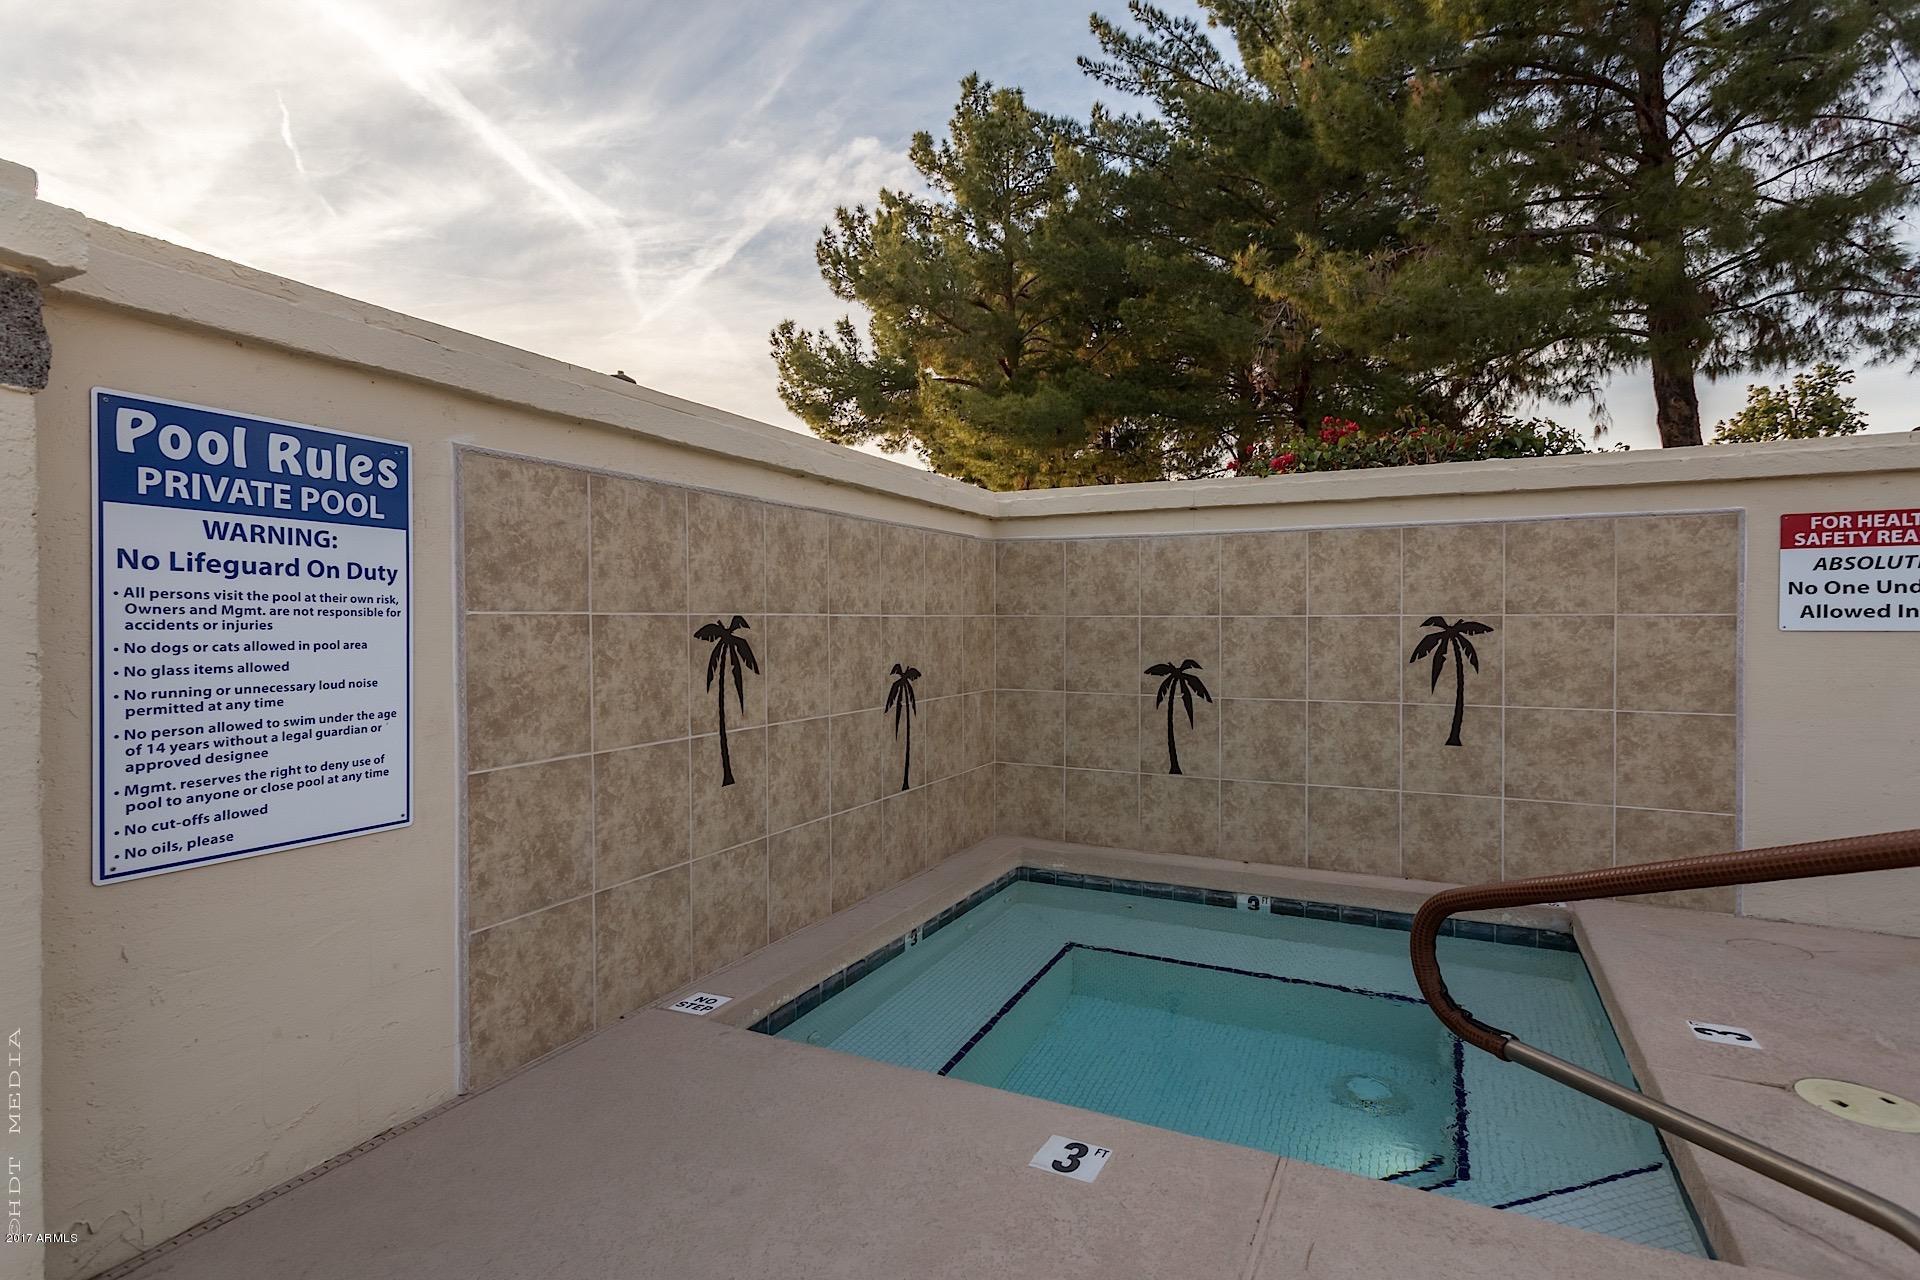 1120 N VAL VISTA Drive # 132, Gilbert, Arizona 85234, 2 Bedrooms Bedrooms, ,Residential Lease,For Rent,1120 N VAL VISTA Drive # 132,5558474